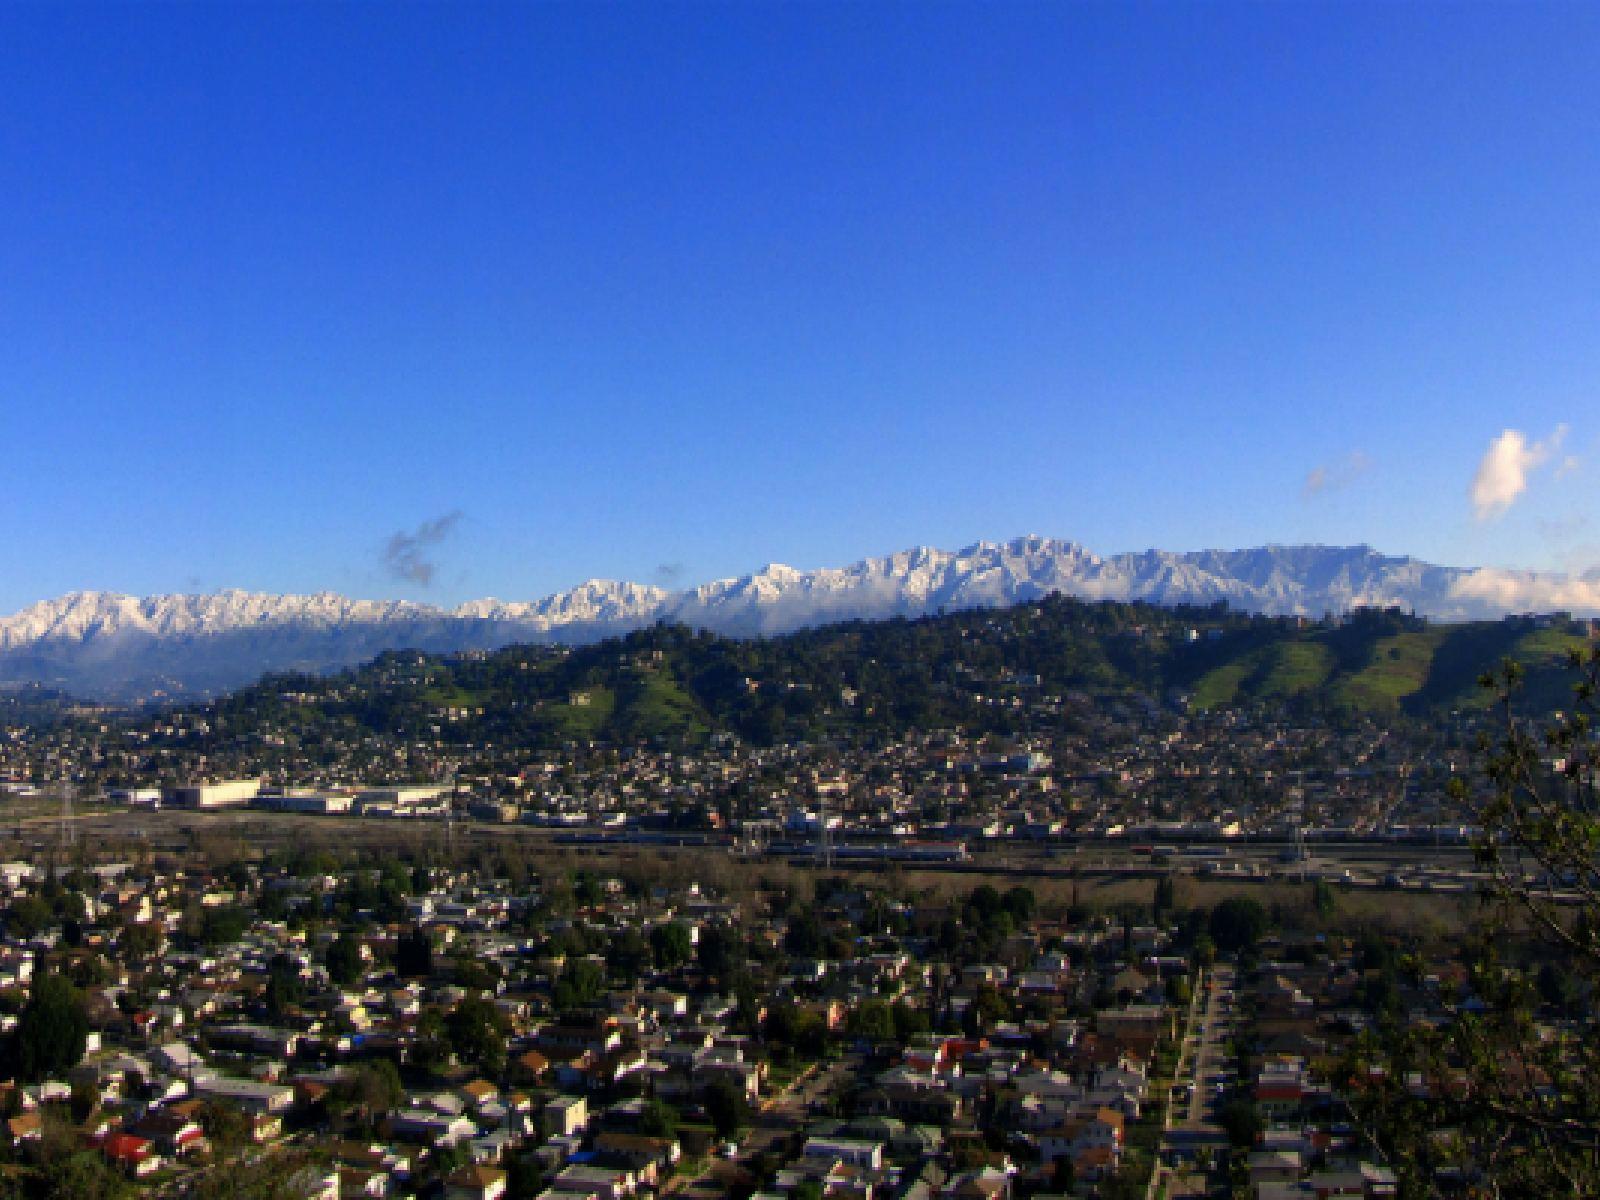 Main image for article titled Hidden Gem Neighborhoods: Tujunga Village